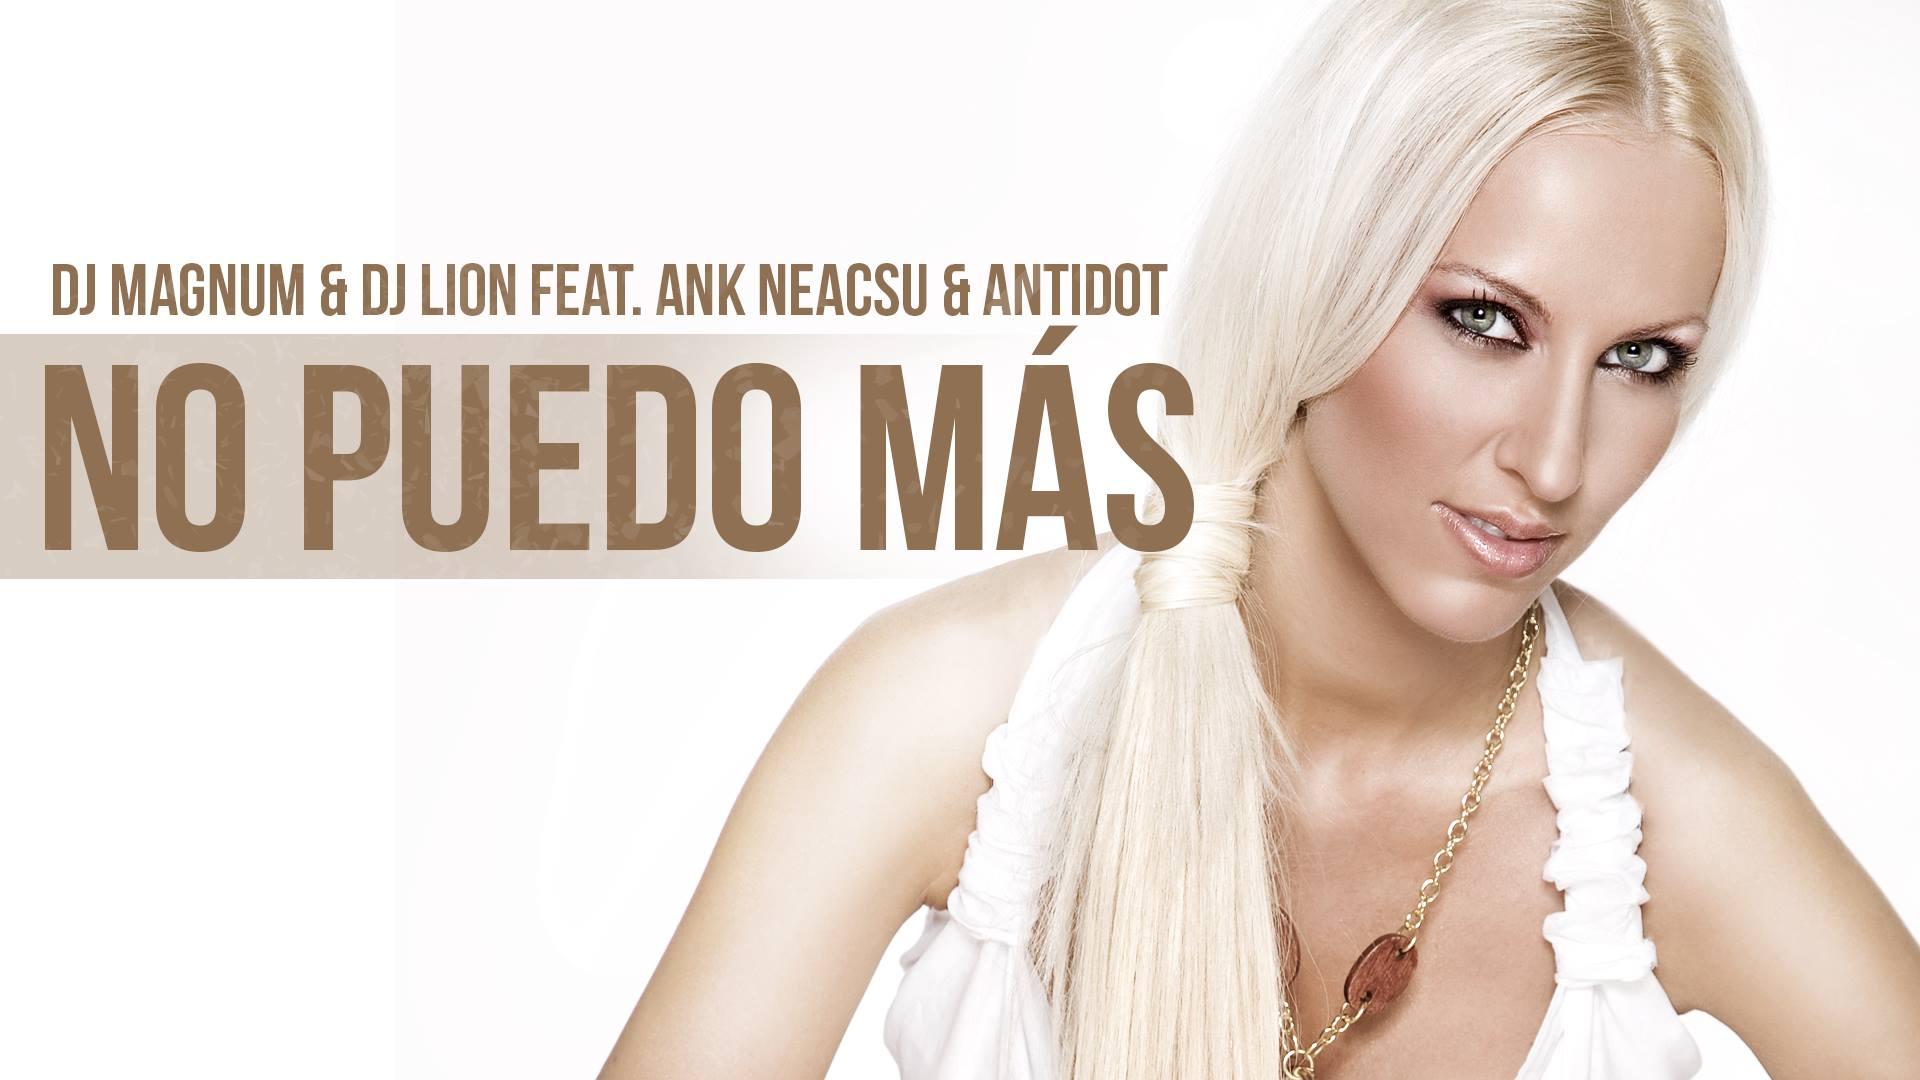 no puedo mas {focus_keyword} Dj Magnum & Dj Lion feat. Ank Neacsu & Antidot - No Puedo Mas (single nou) no puedo mas